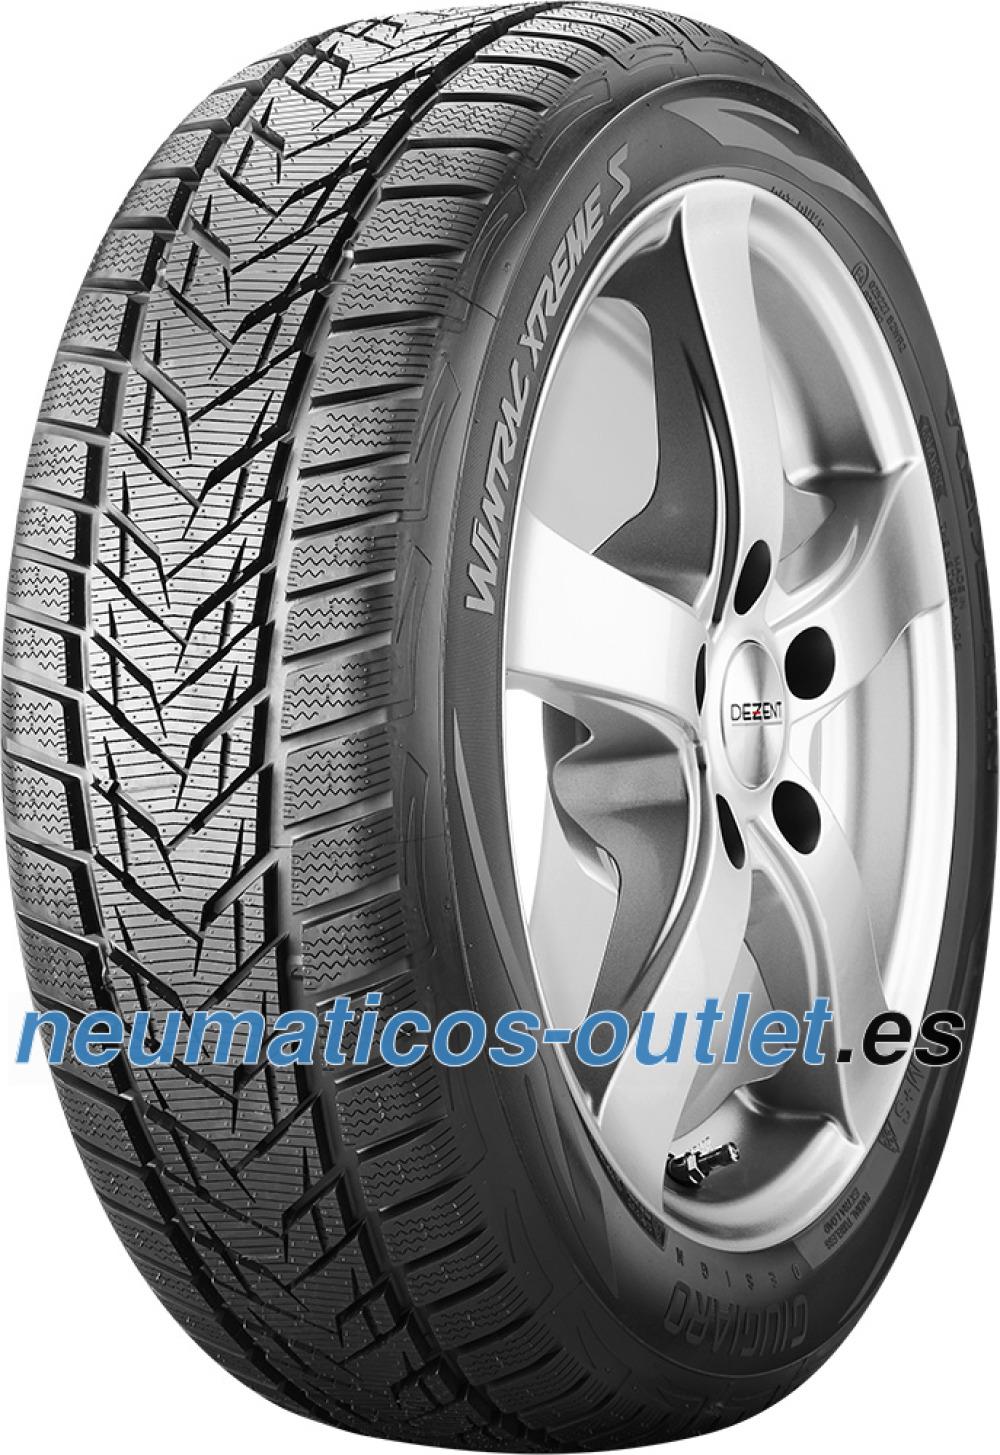 Vredestein Wintrac Xtreme S ( 225/55 R19 99V , con cordón de protección de llanta (FSL) )